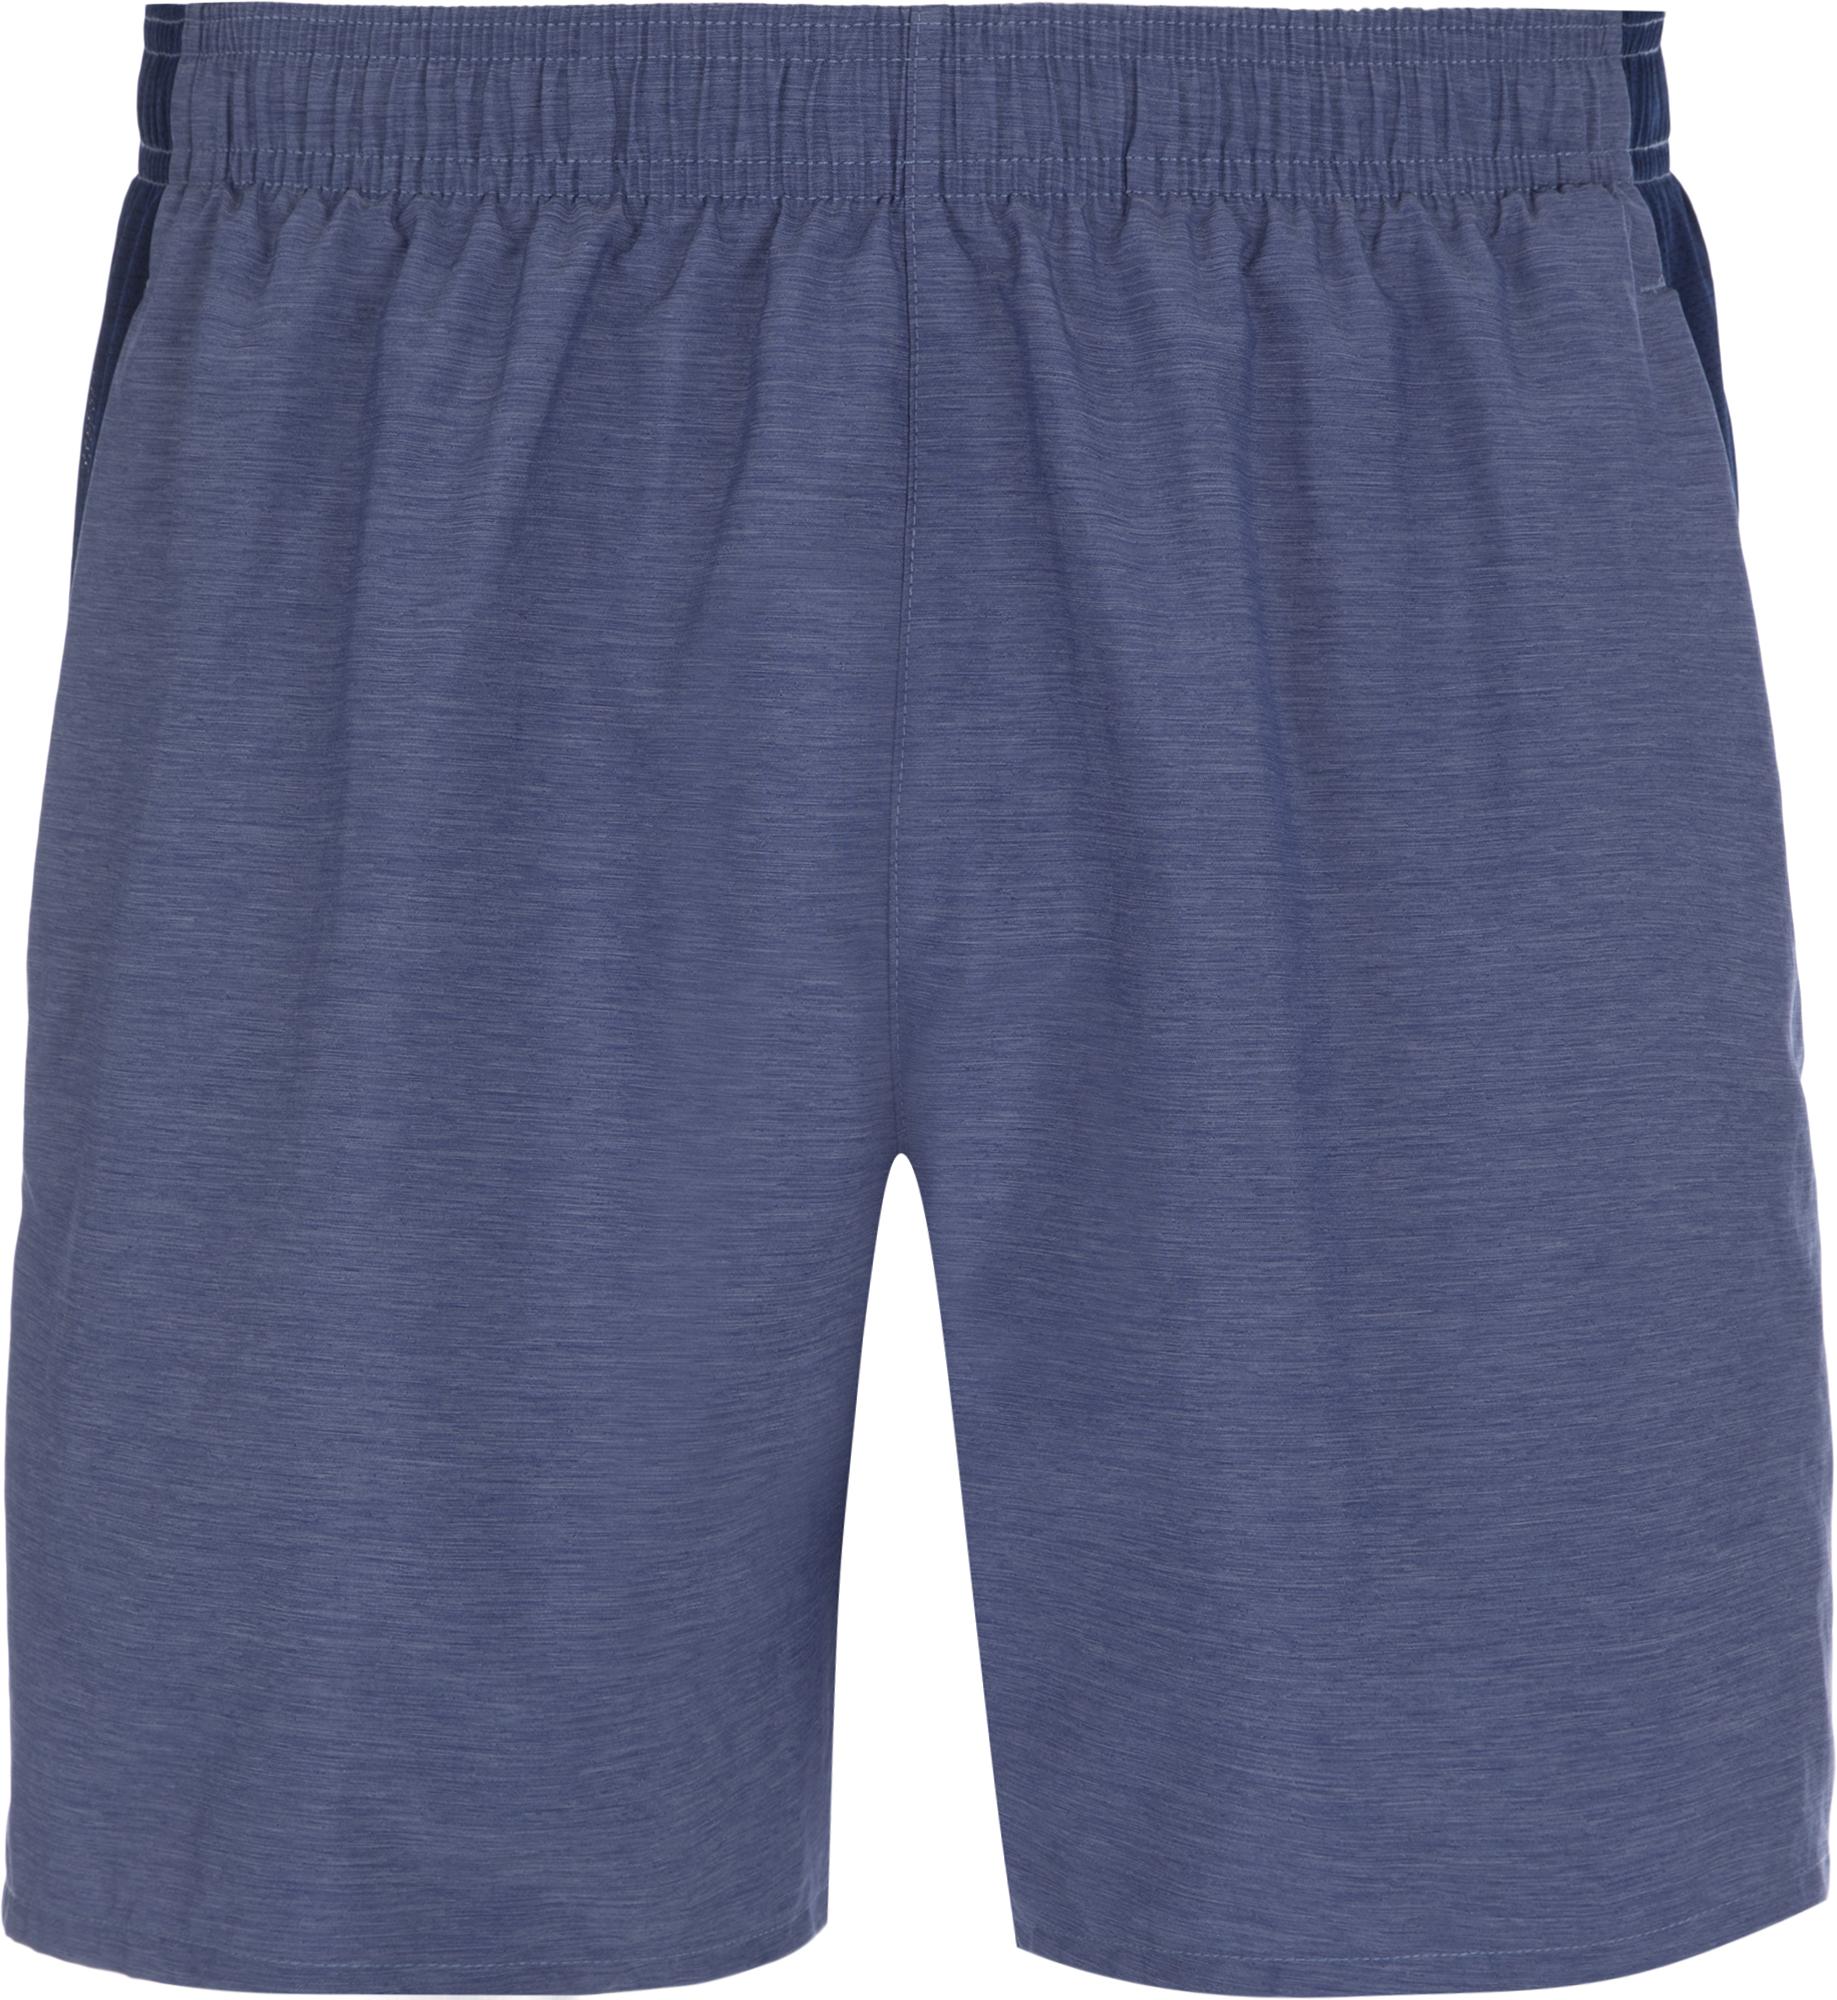 Nike Шорты мужские Nike Challenger, размер 54-56 недорго, оригинальная цена